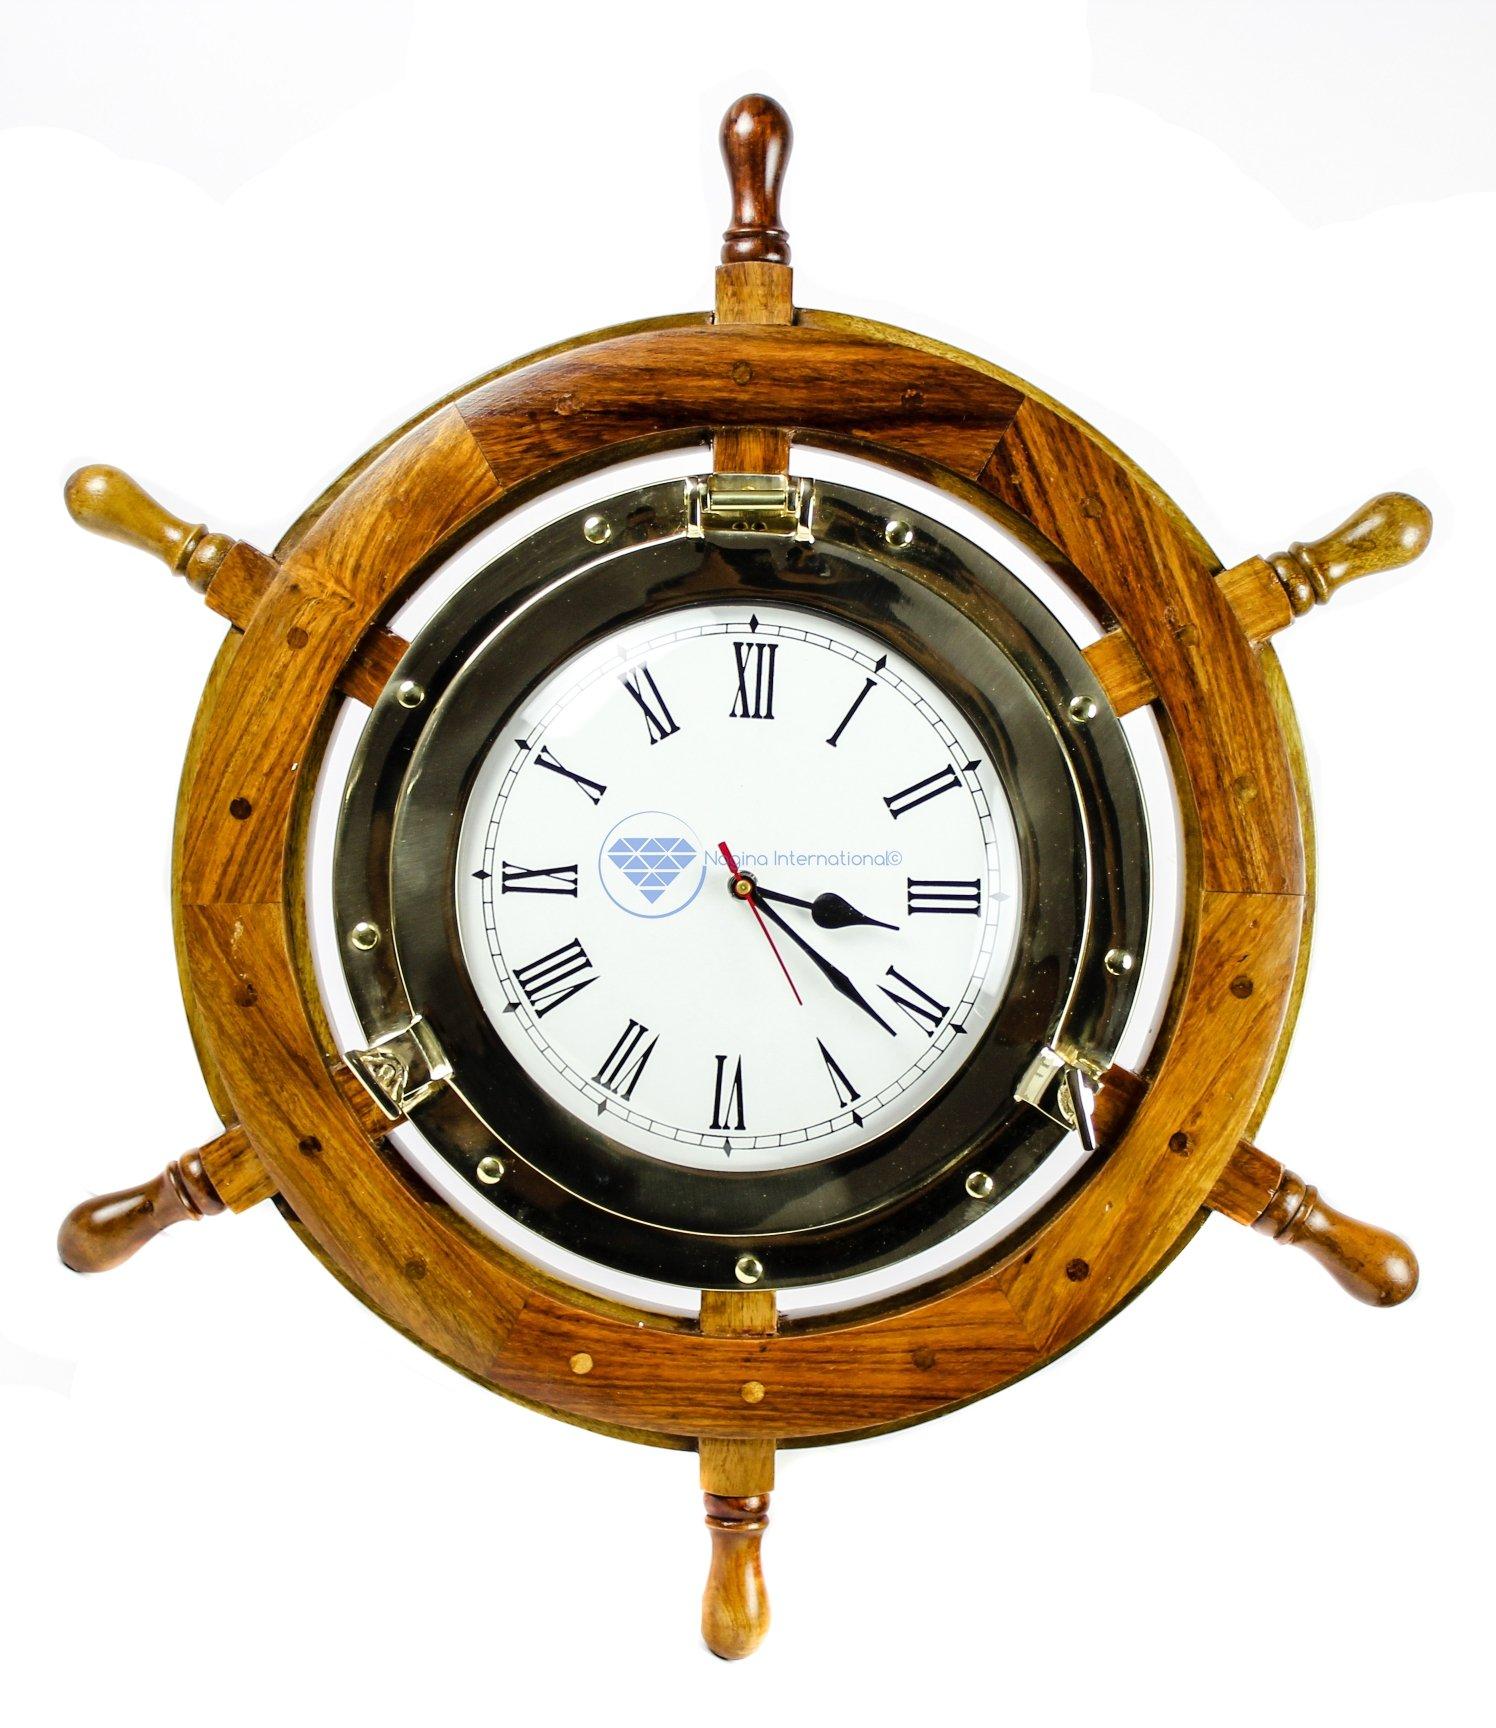 Brass Nautical Full Porthole Tim'es Clock Ship Wheel   Pirate's Maritime Vintage Gift   Nagina International (36 Inches)